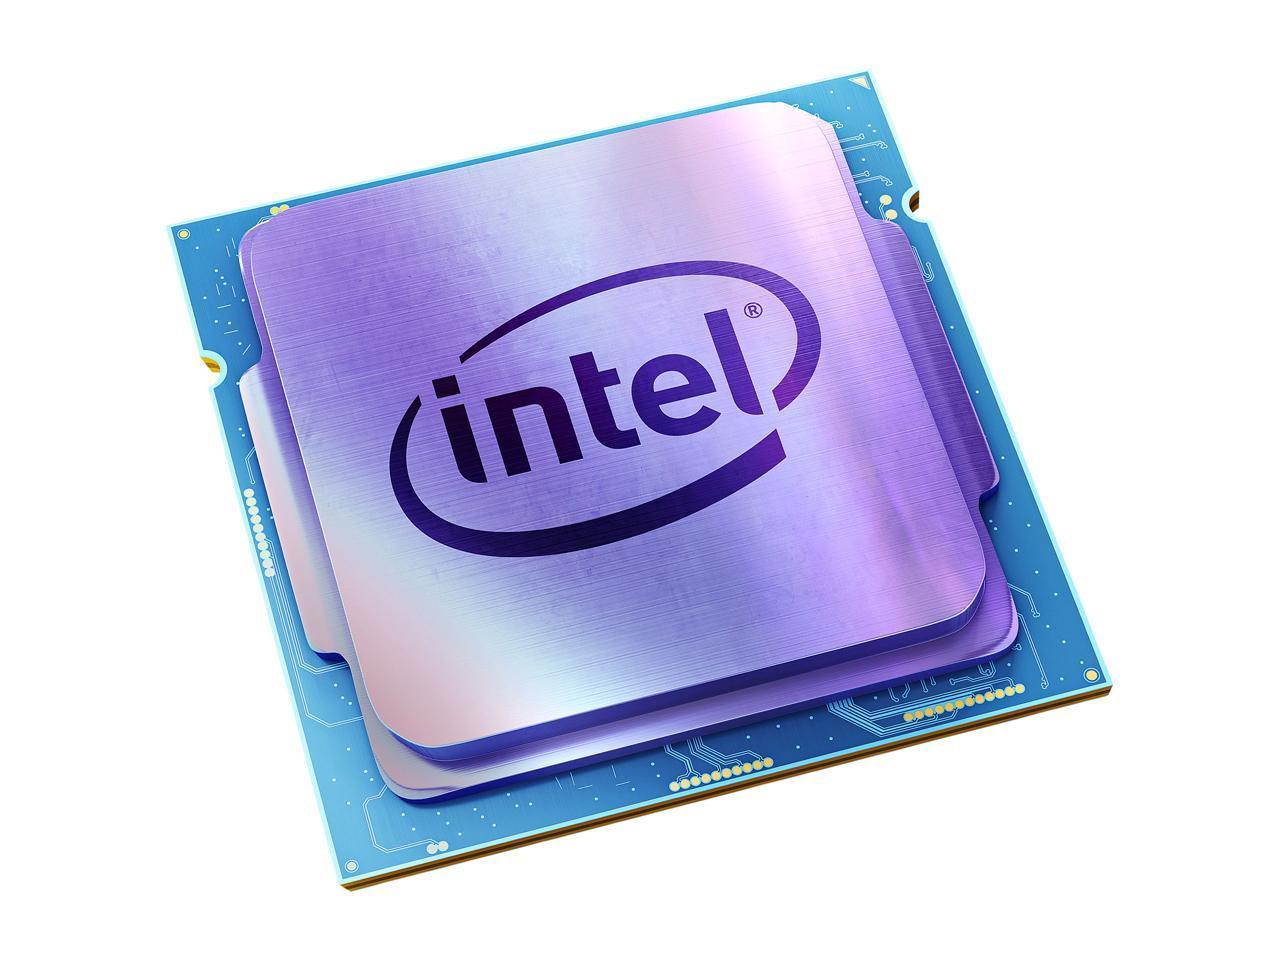 Intel Core i5-10400 Comet Lake 6-Core 2.9 GHz LGA 1200 65W BX8070110400 Desktop Processor Intel UHD Graphics 630 6